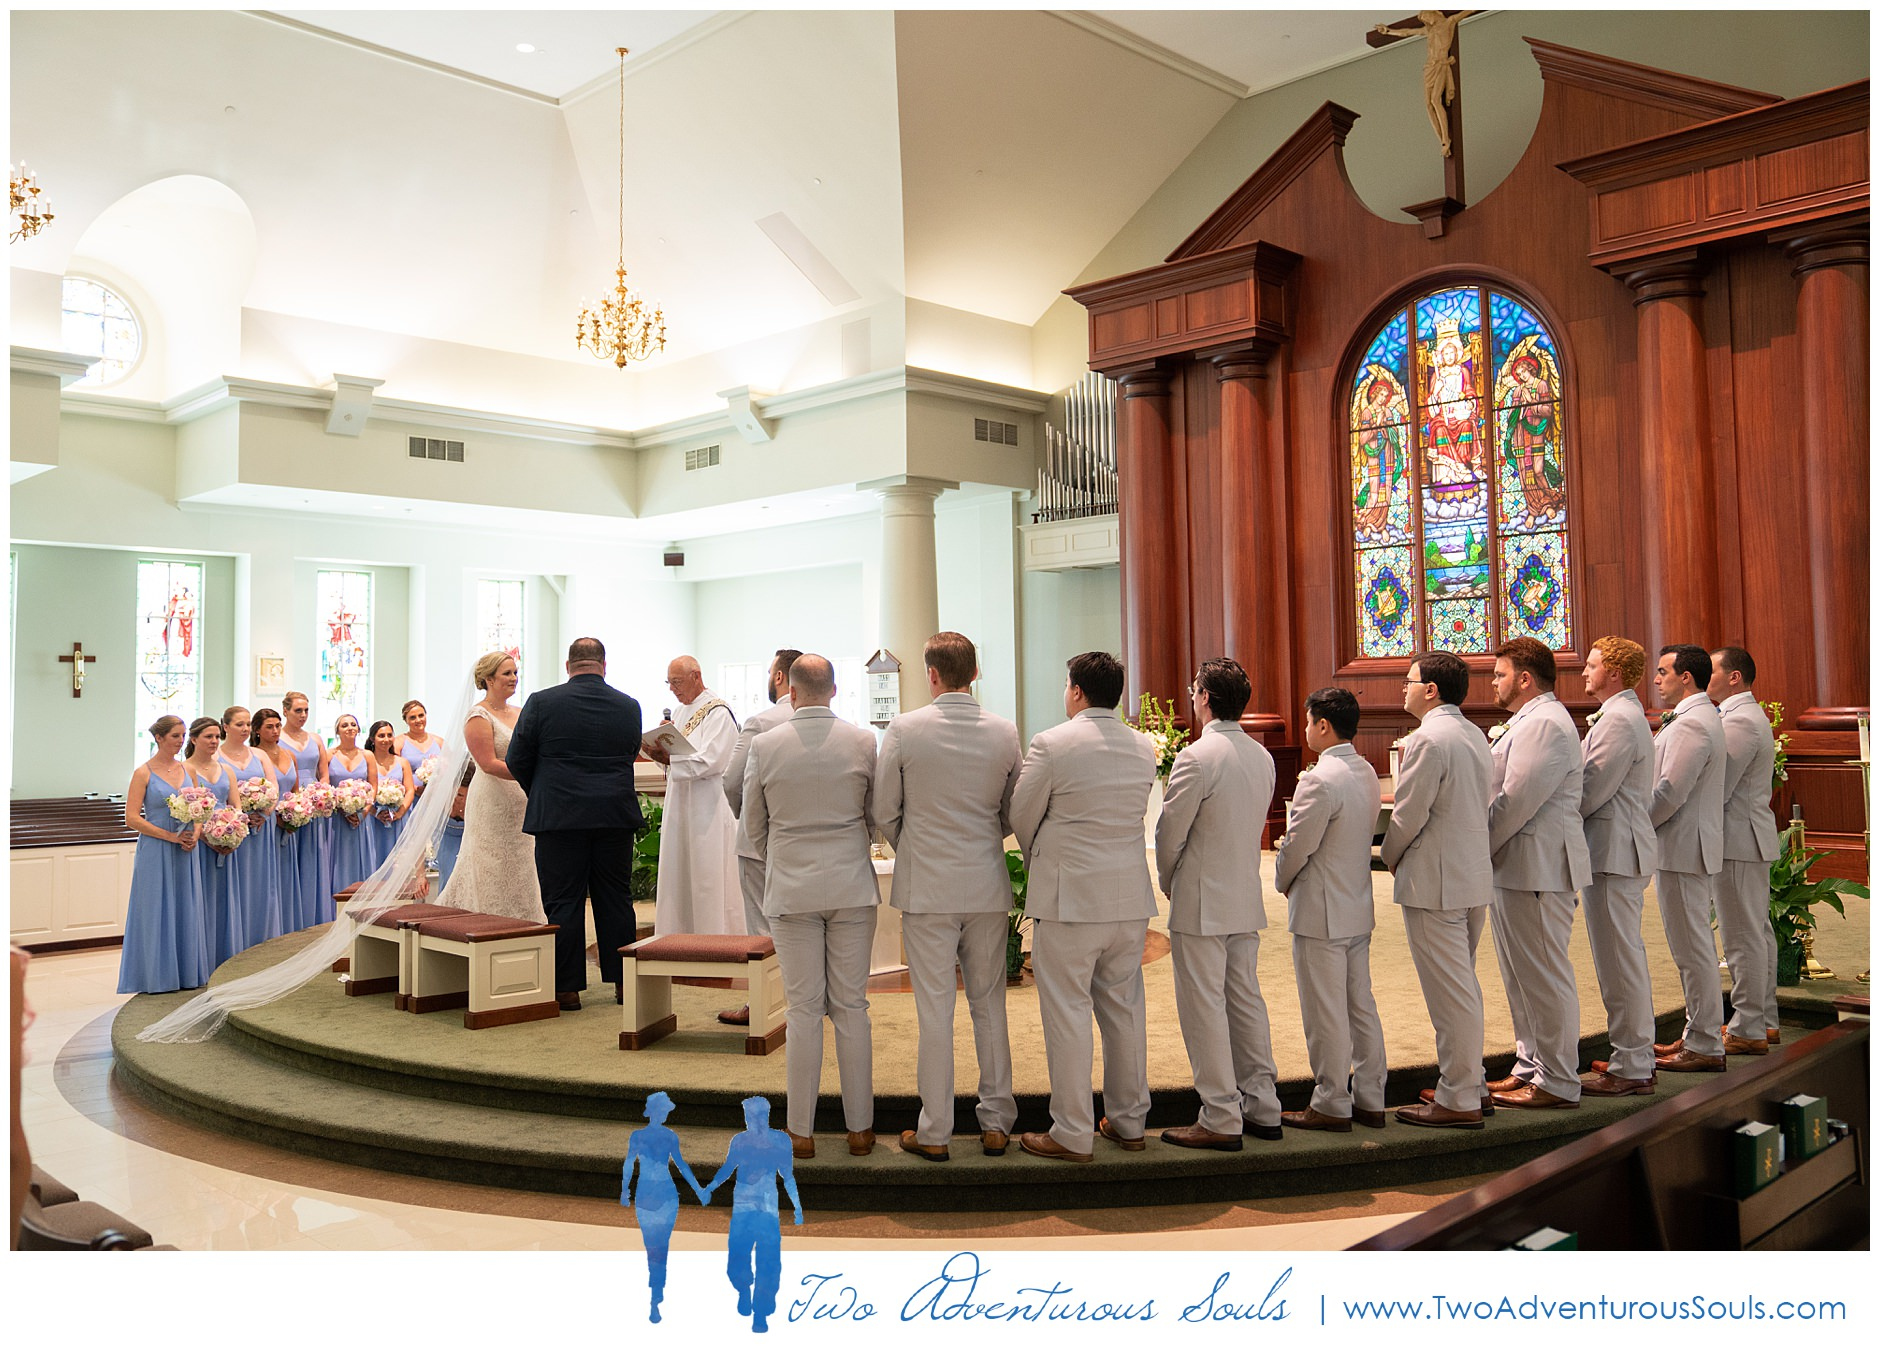 Cape Cod Wedding Photographers, Destination Wedding Photographers, Two Adventurous Souls-081019_0022.jpg